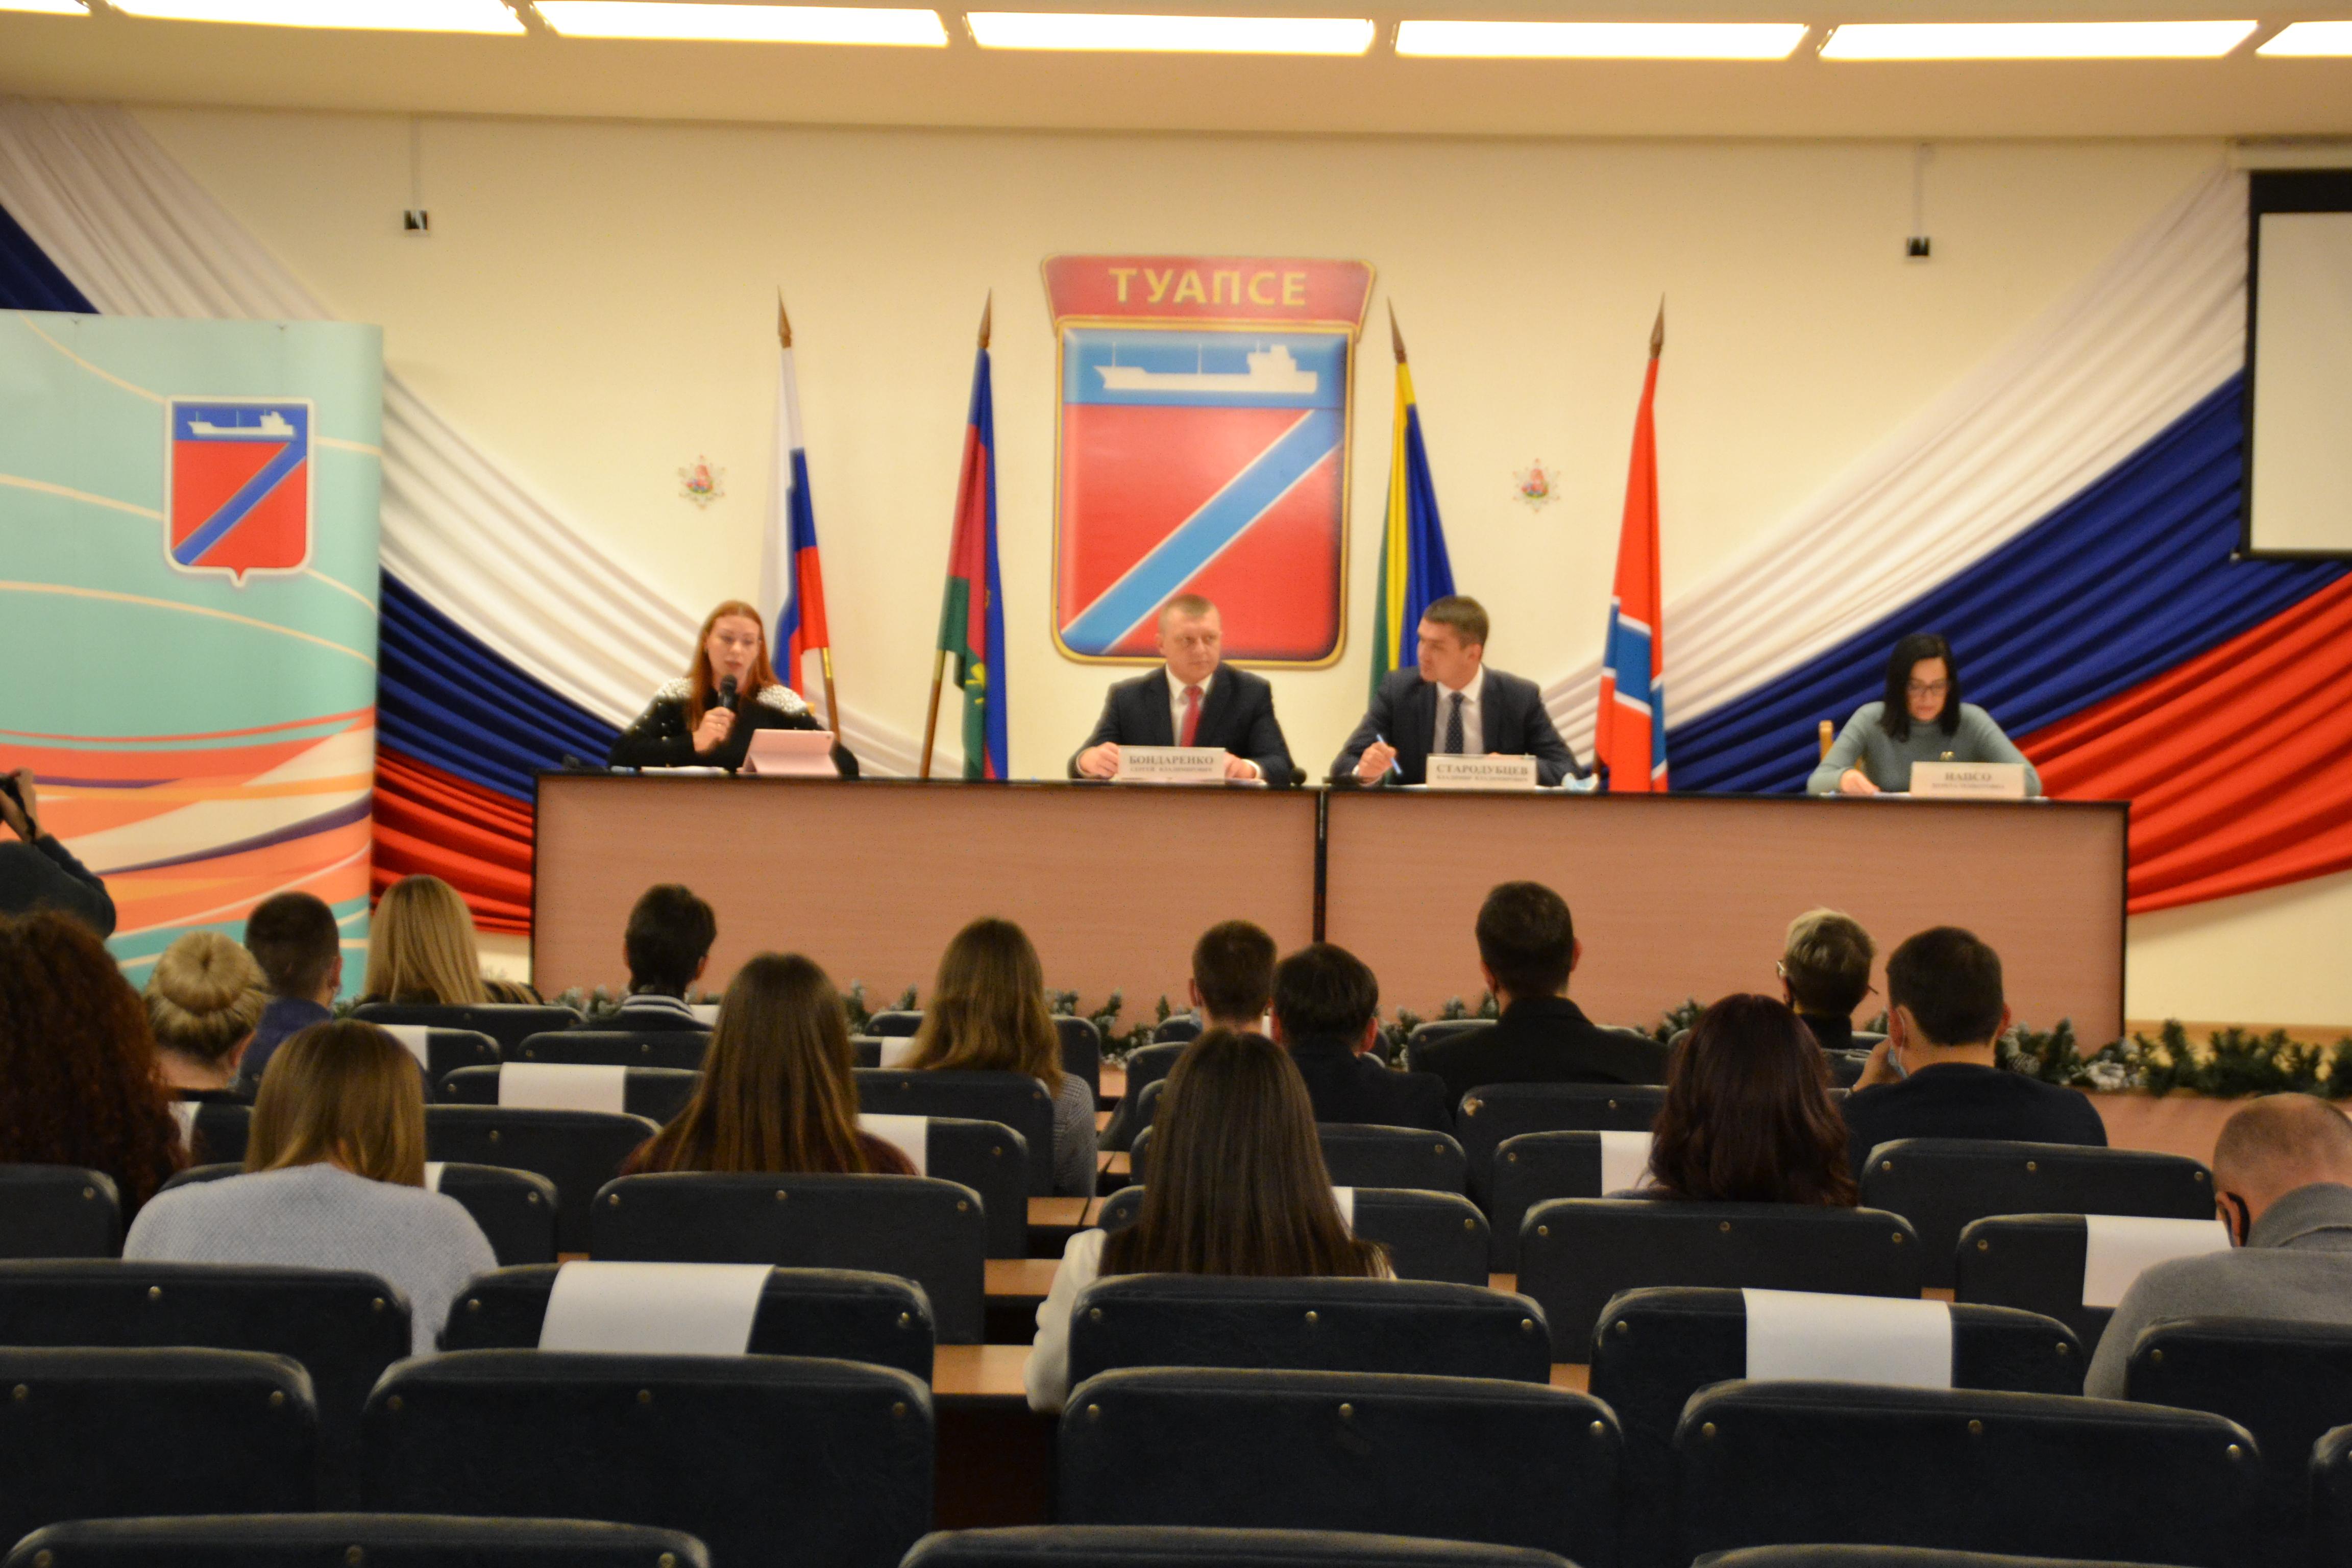 Молодежный Совет при главе города Туапсе